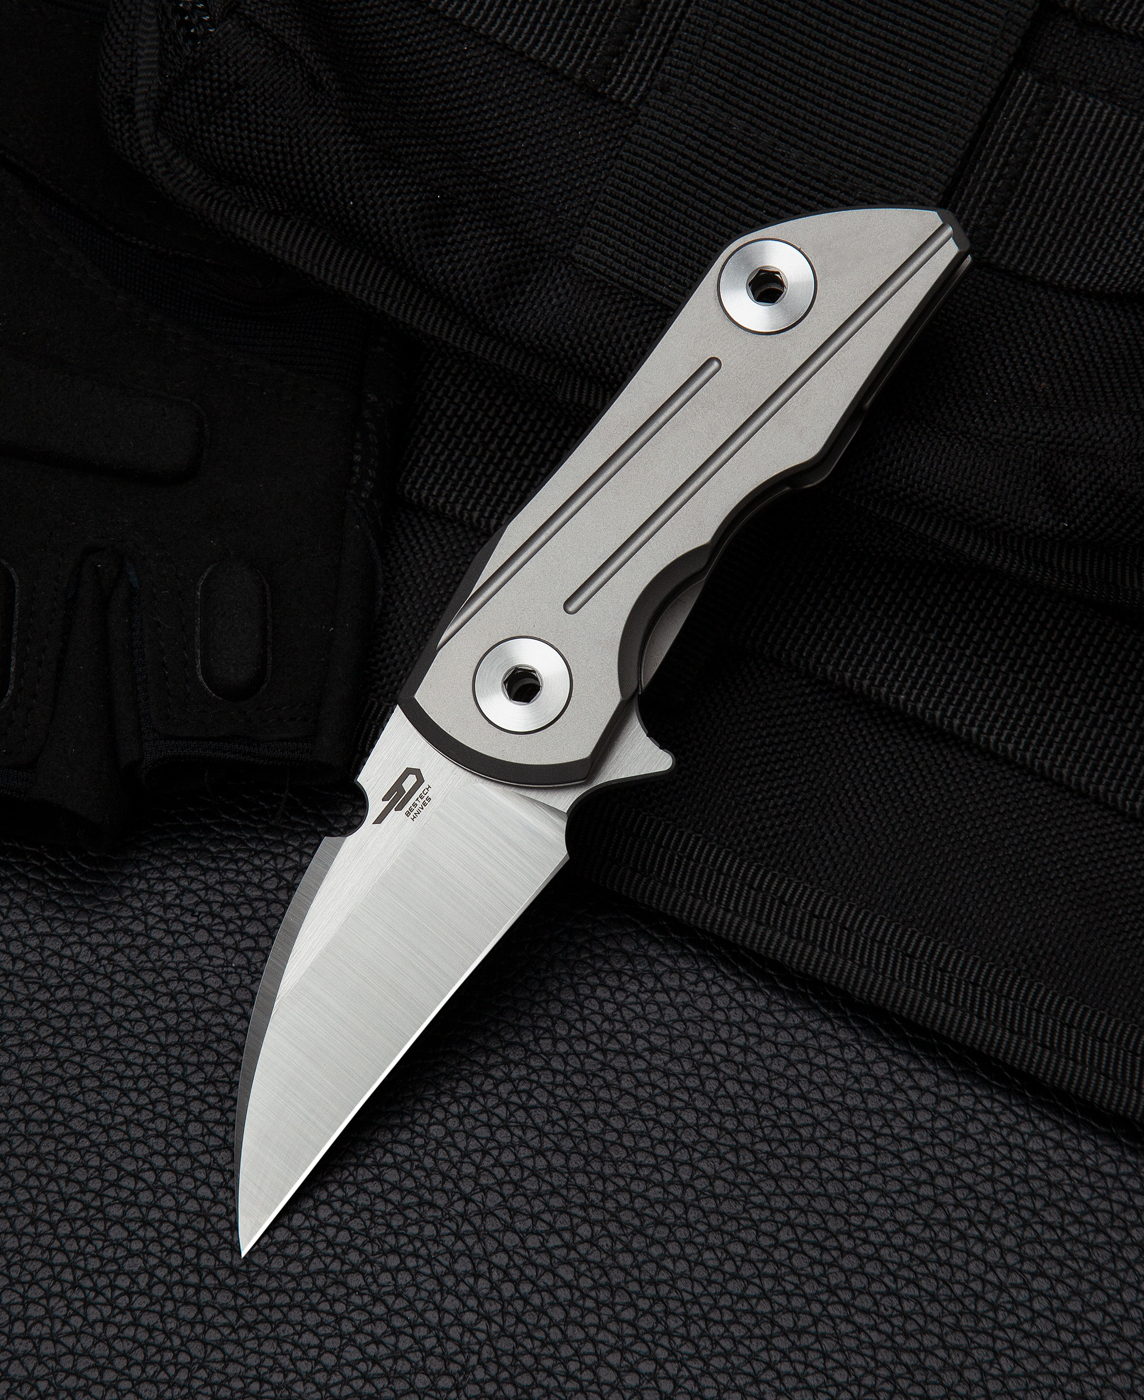 Складной нож Bestech 2005 Delta, сталь S35VN, рукоять титан